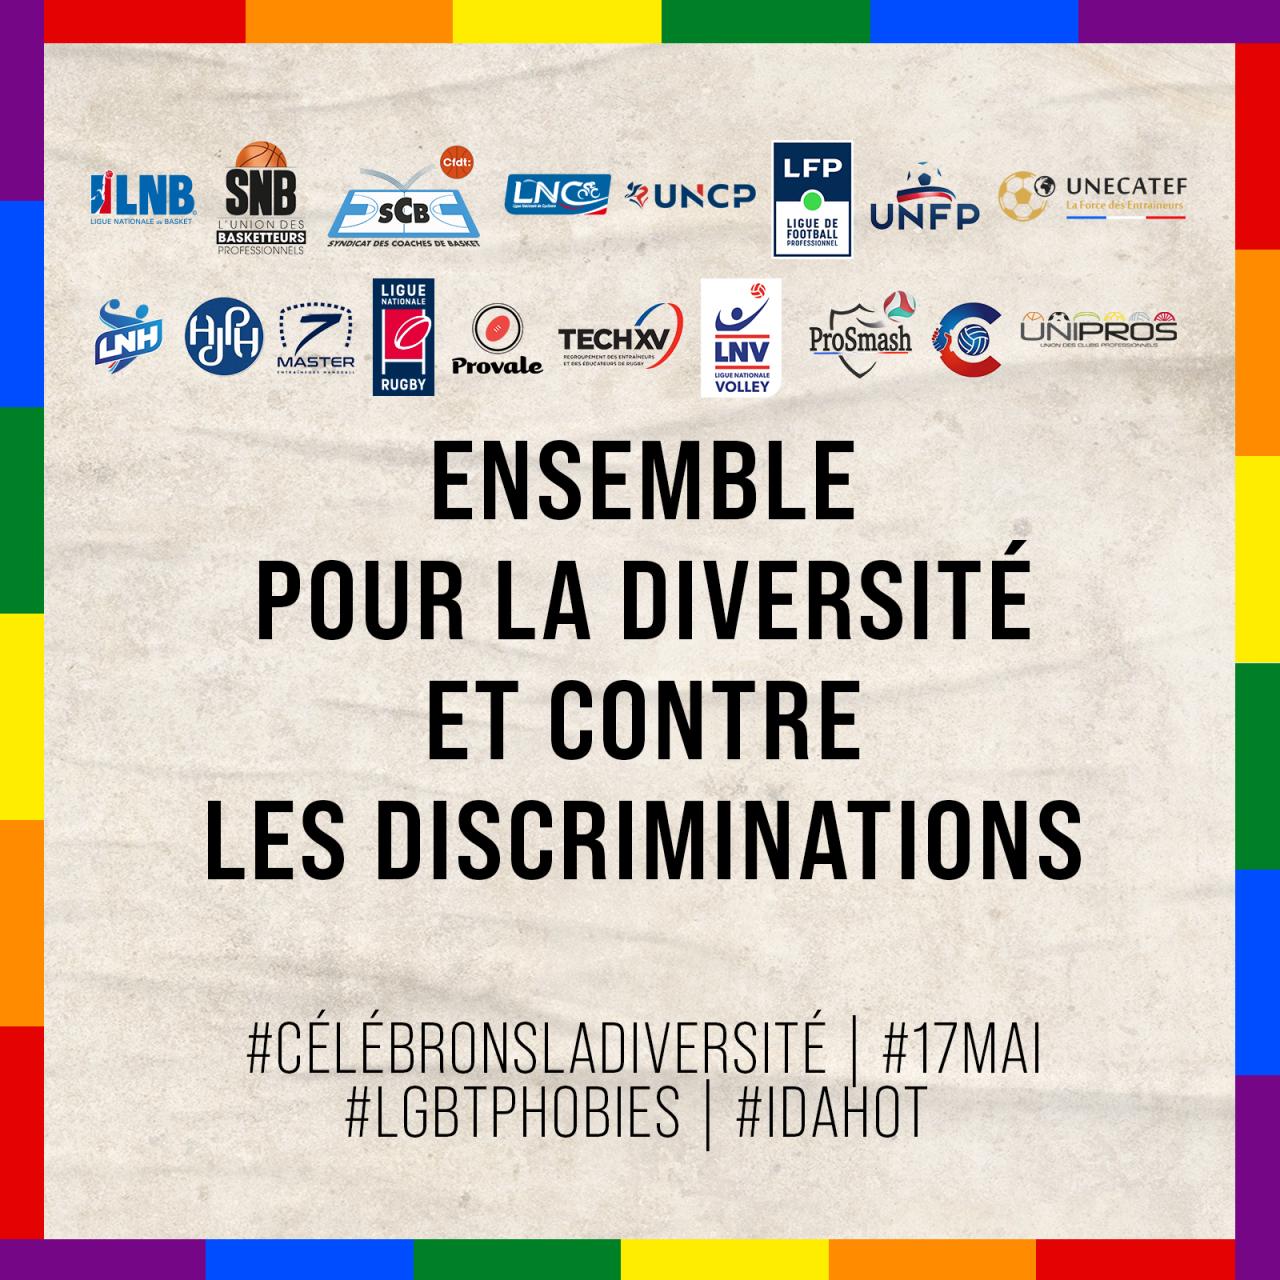 https://www.ajph.fr/wp-content/uploads/2021/05/Discrimination-homophobie-SPORTS-CARRE-1280x1280.png